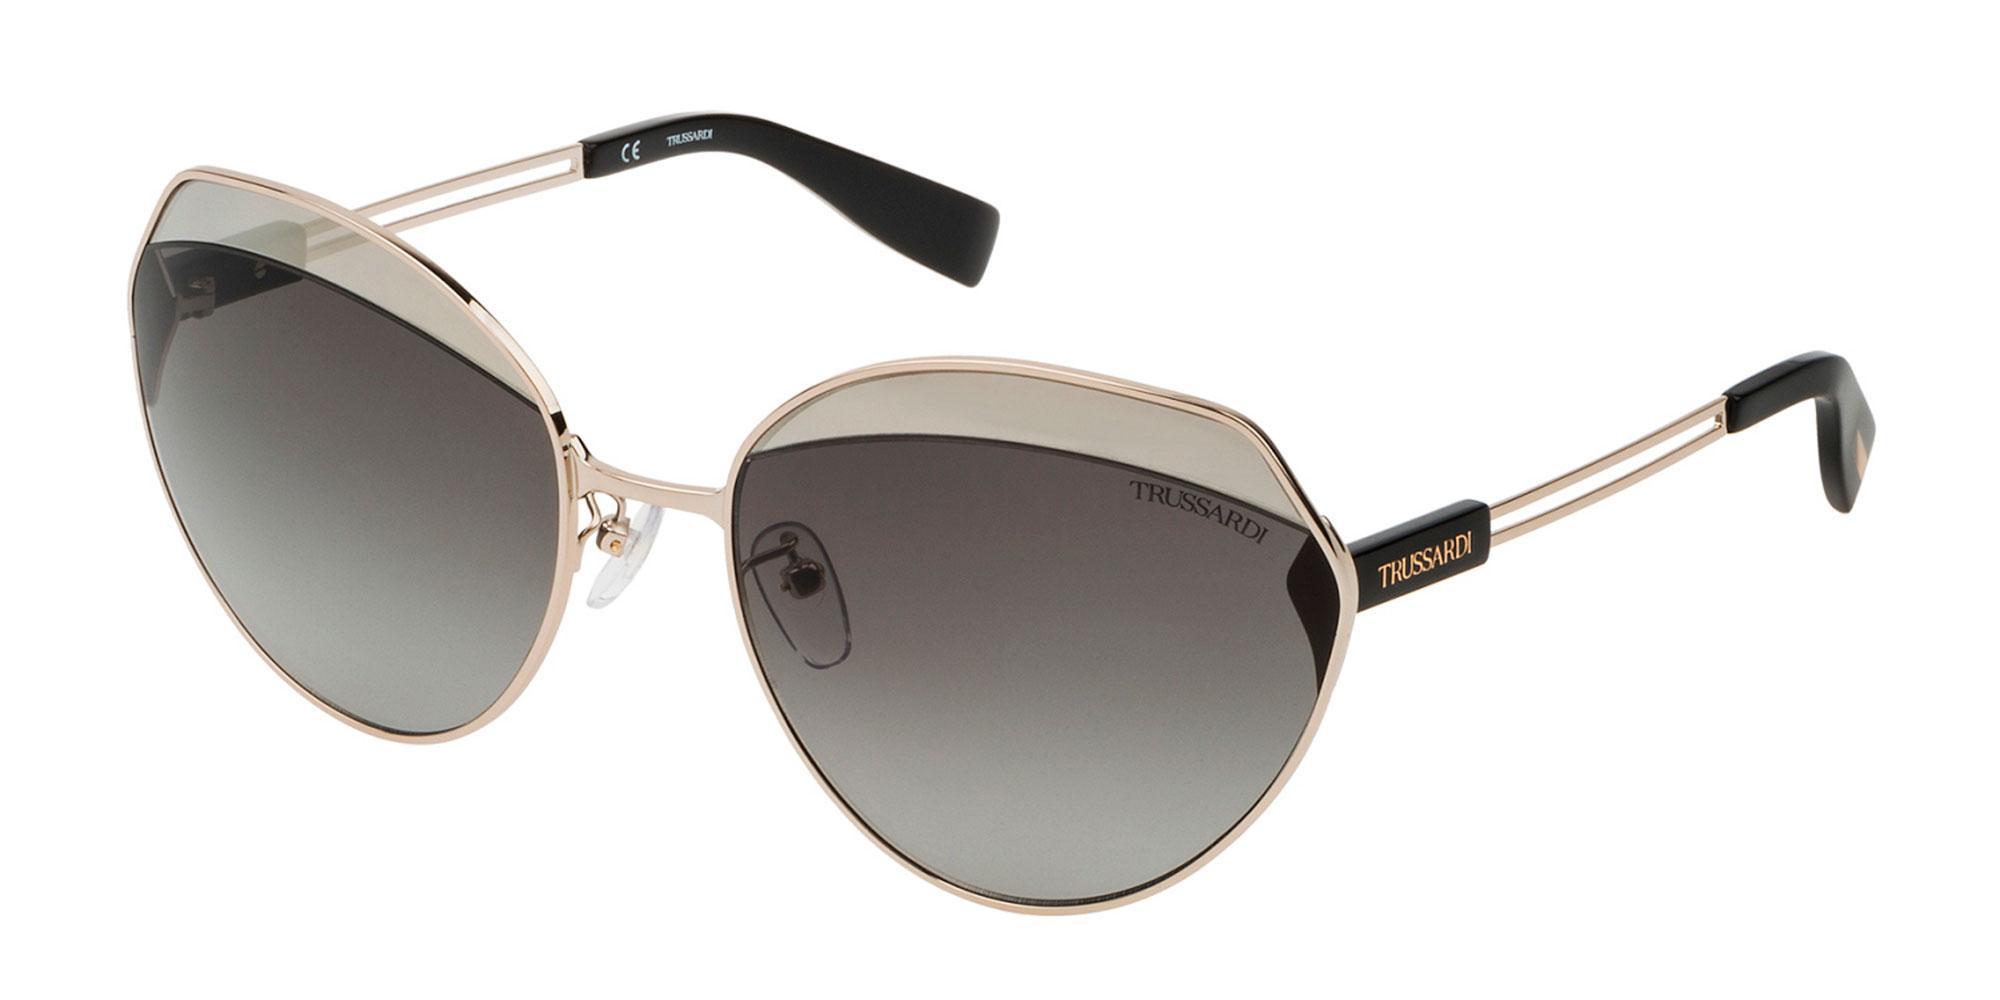 0594 STR298 Sunglasses, Trussardi